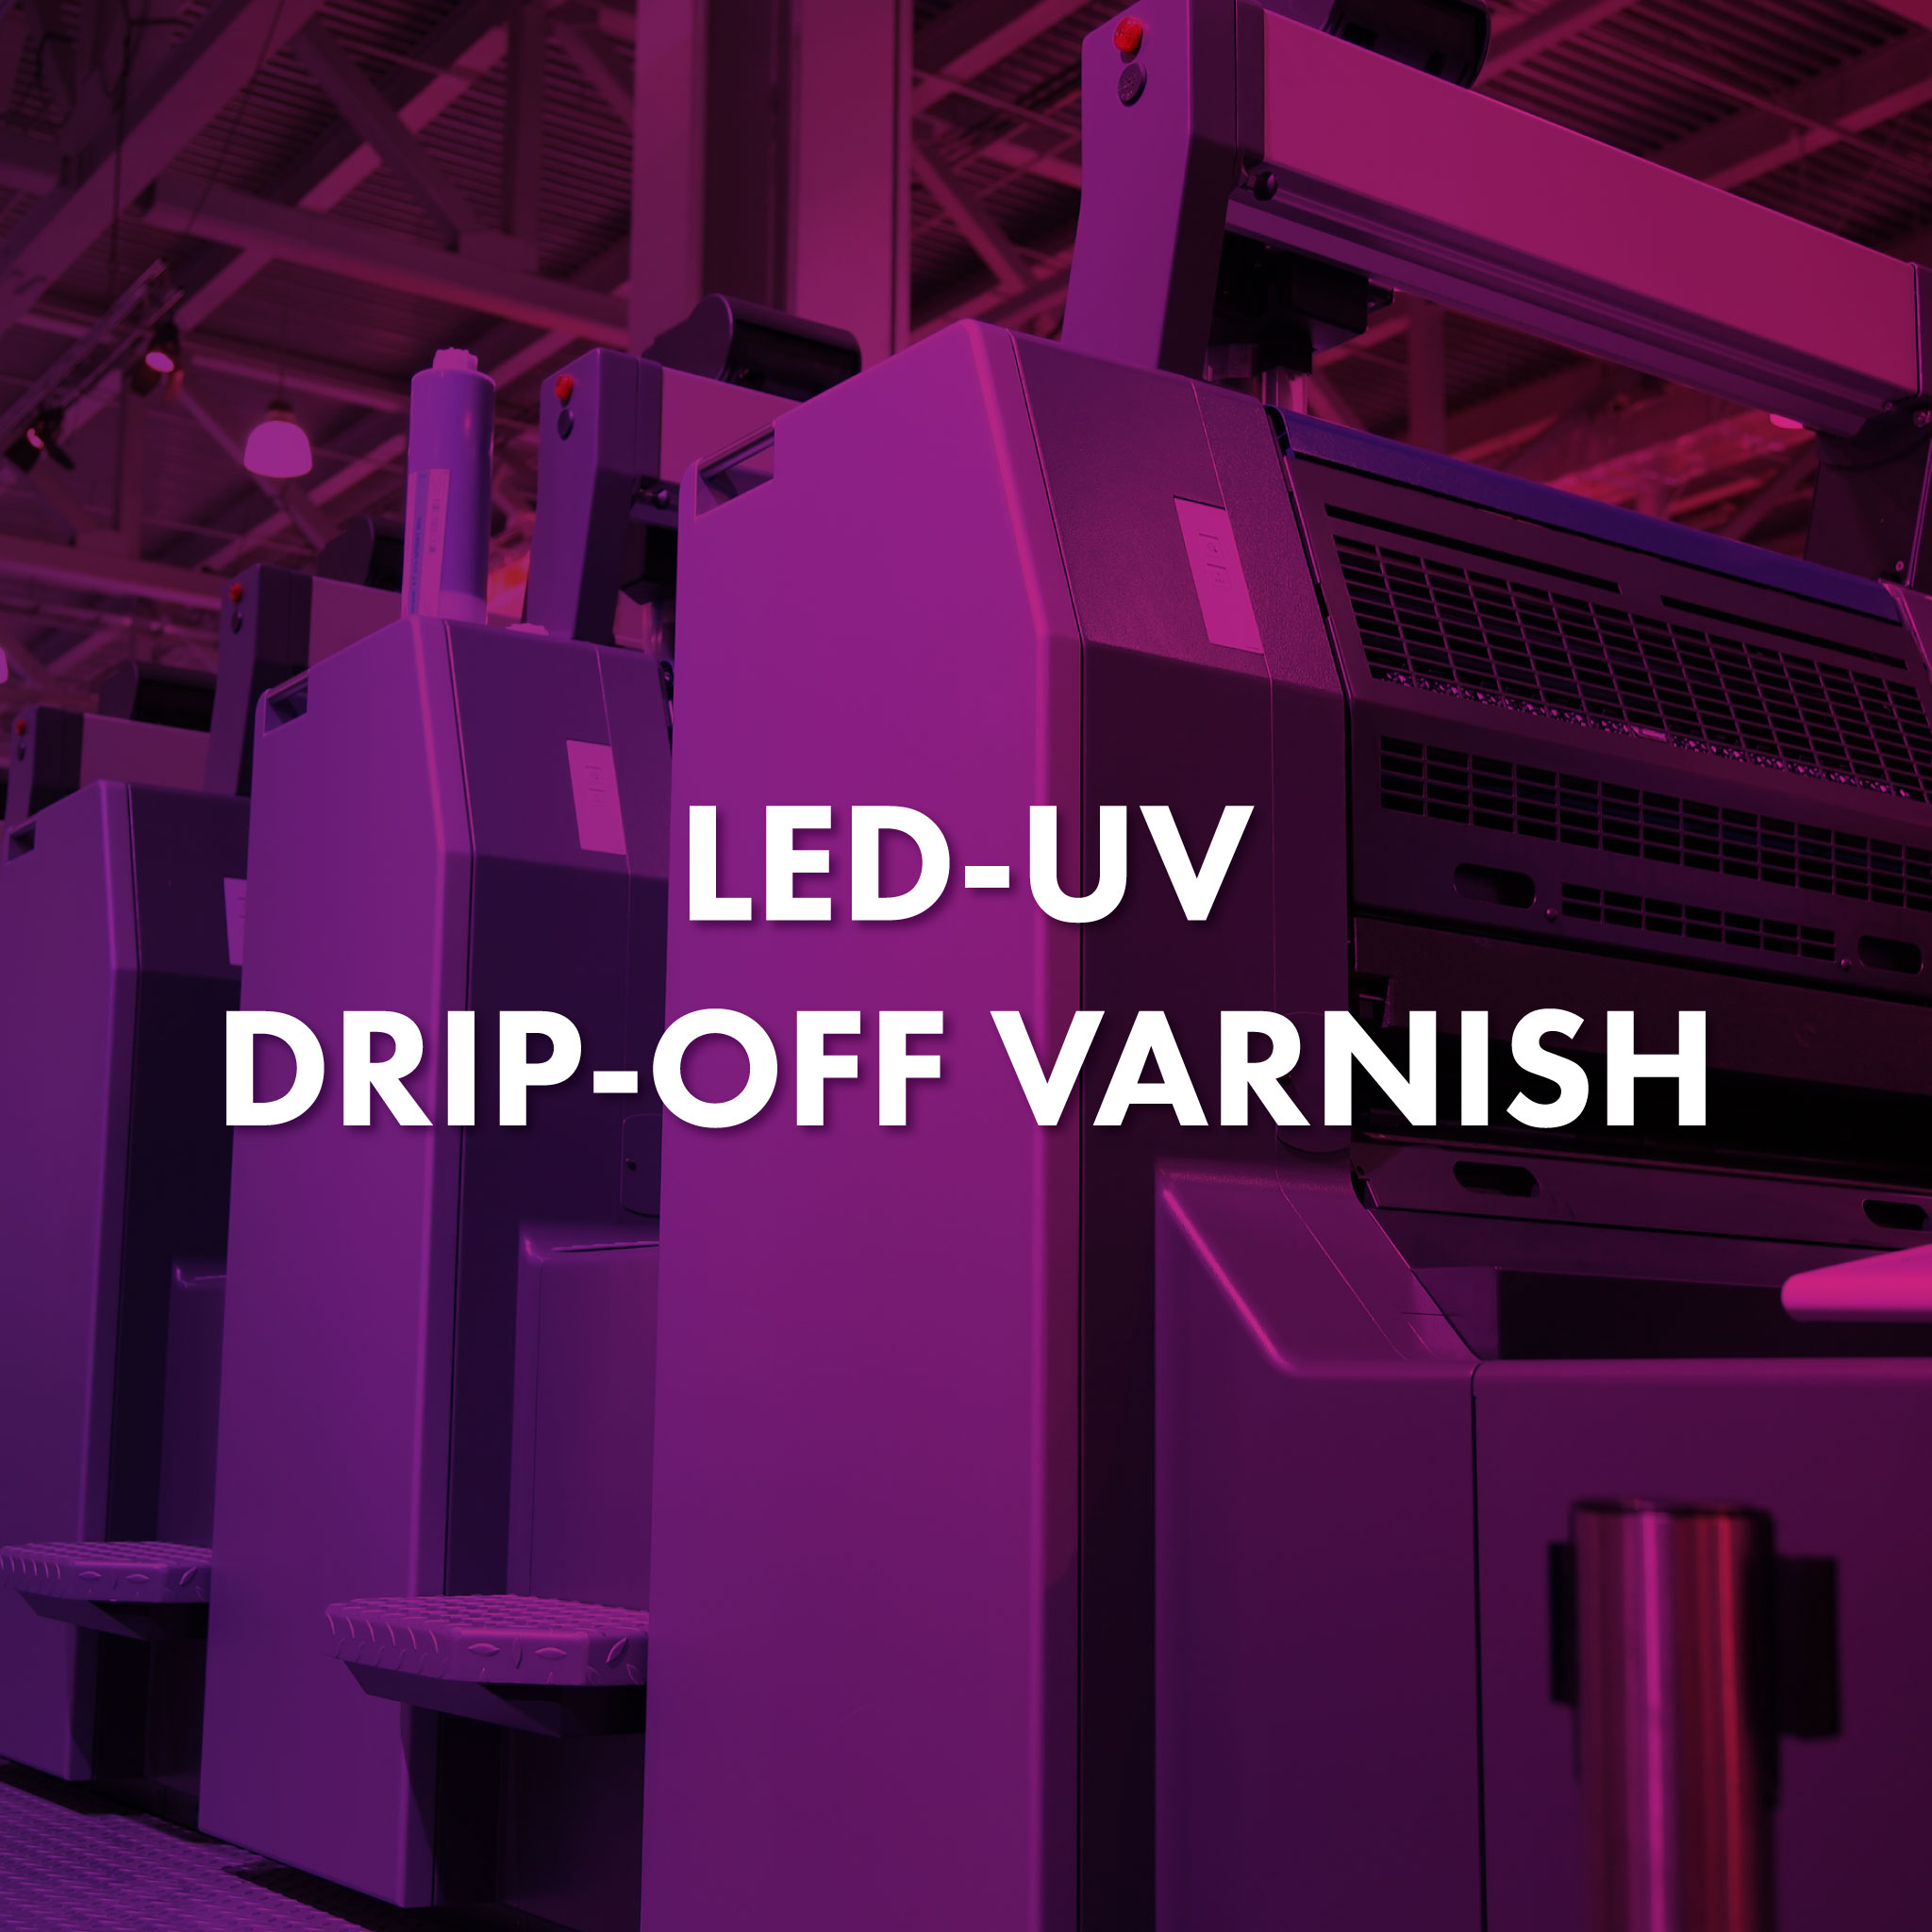 LED UV Press - Drip Off Varnish